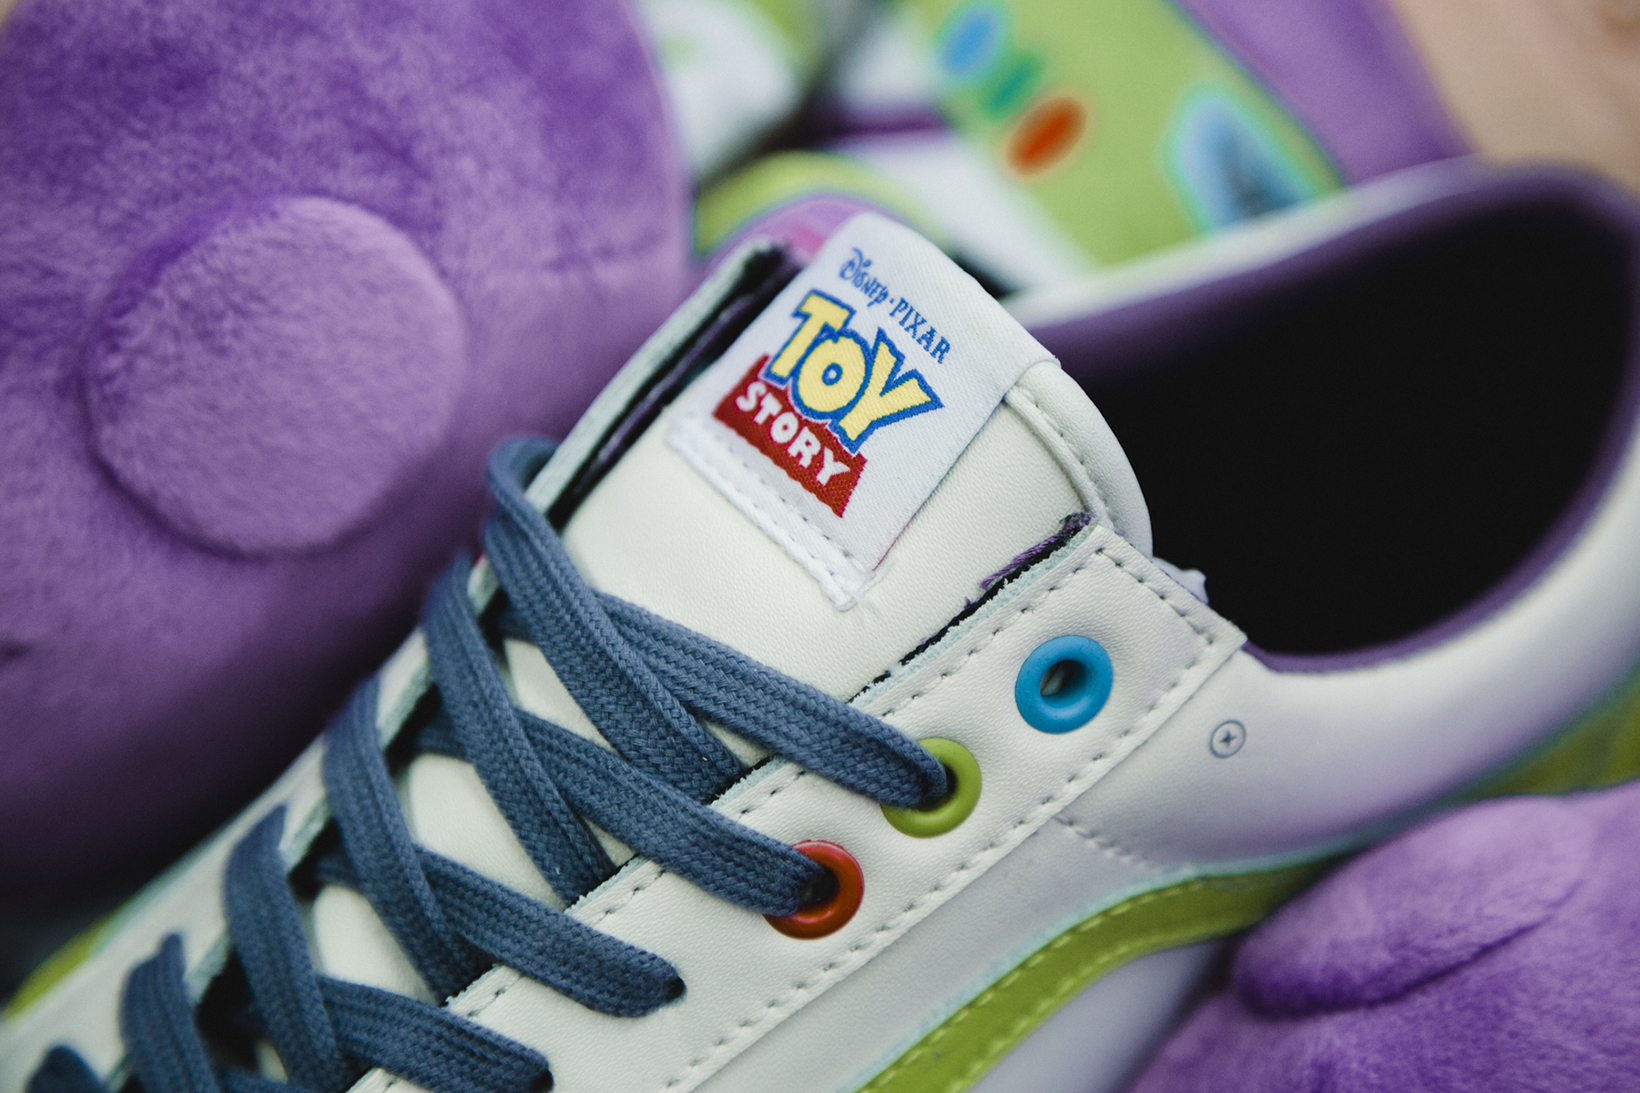 Toy Story Vans Sneakers Woody Buzz Lightyear Disney - 1765036